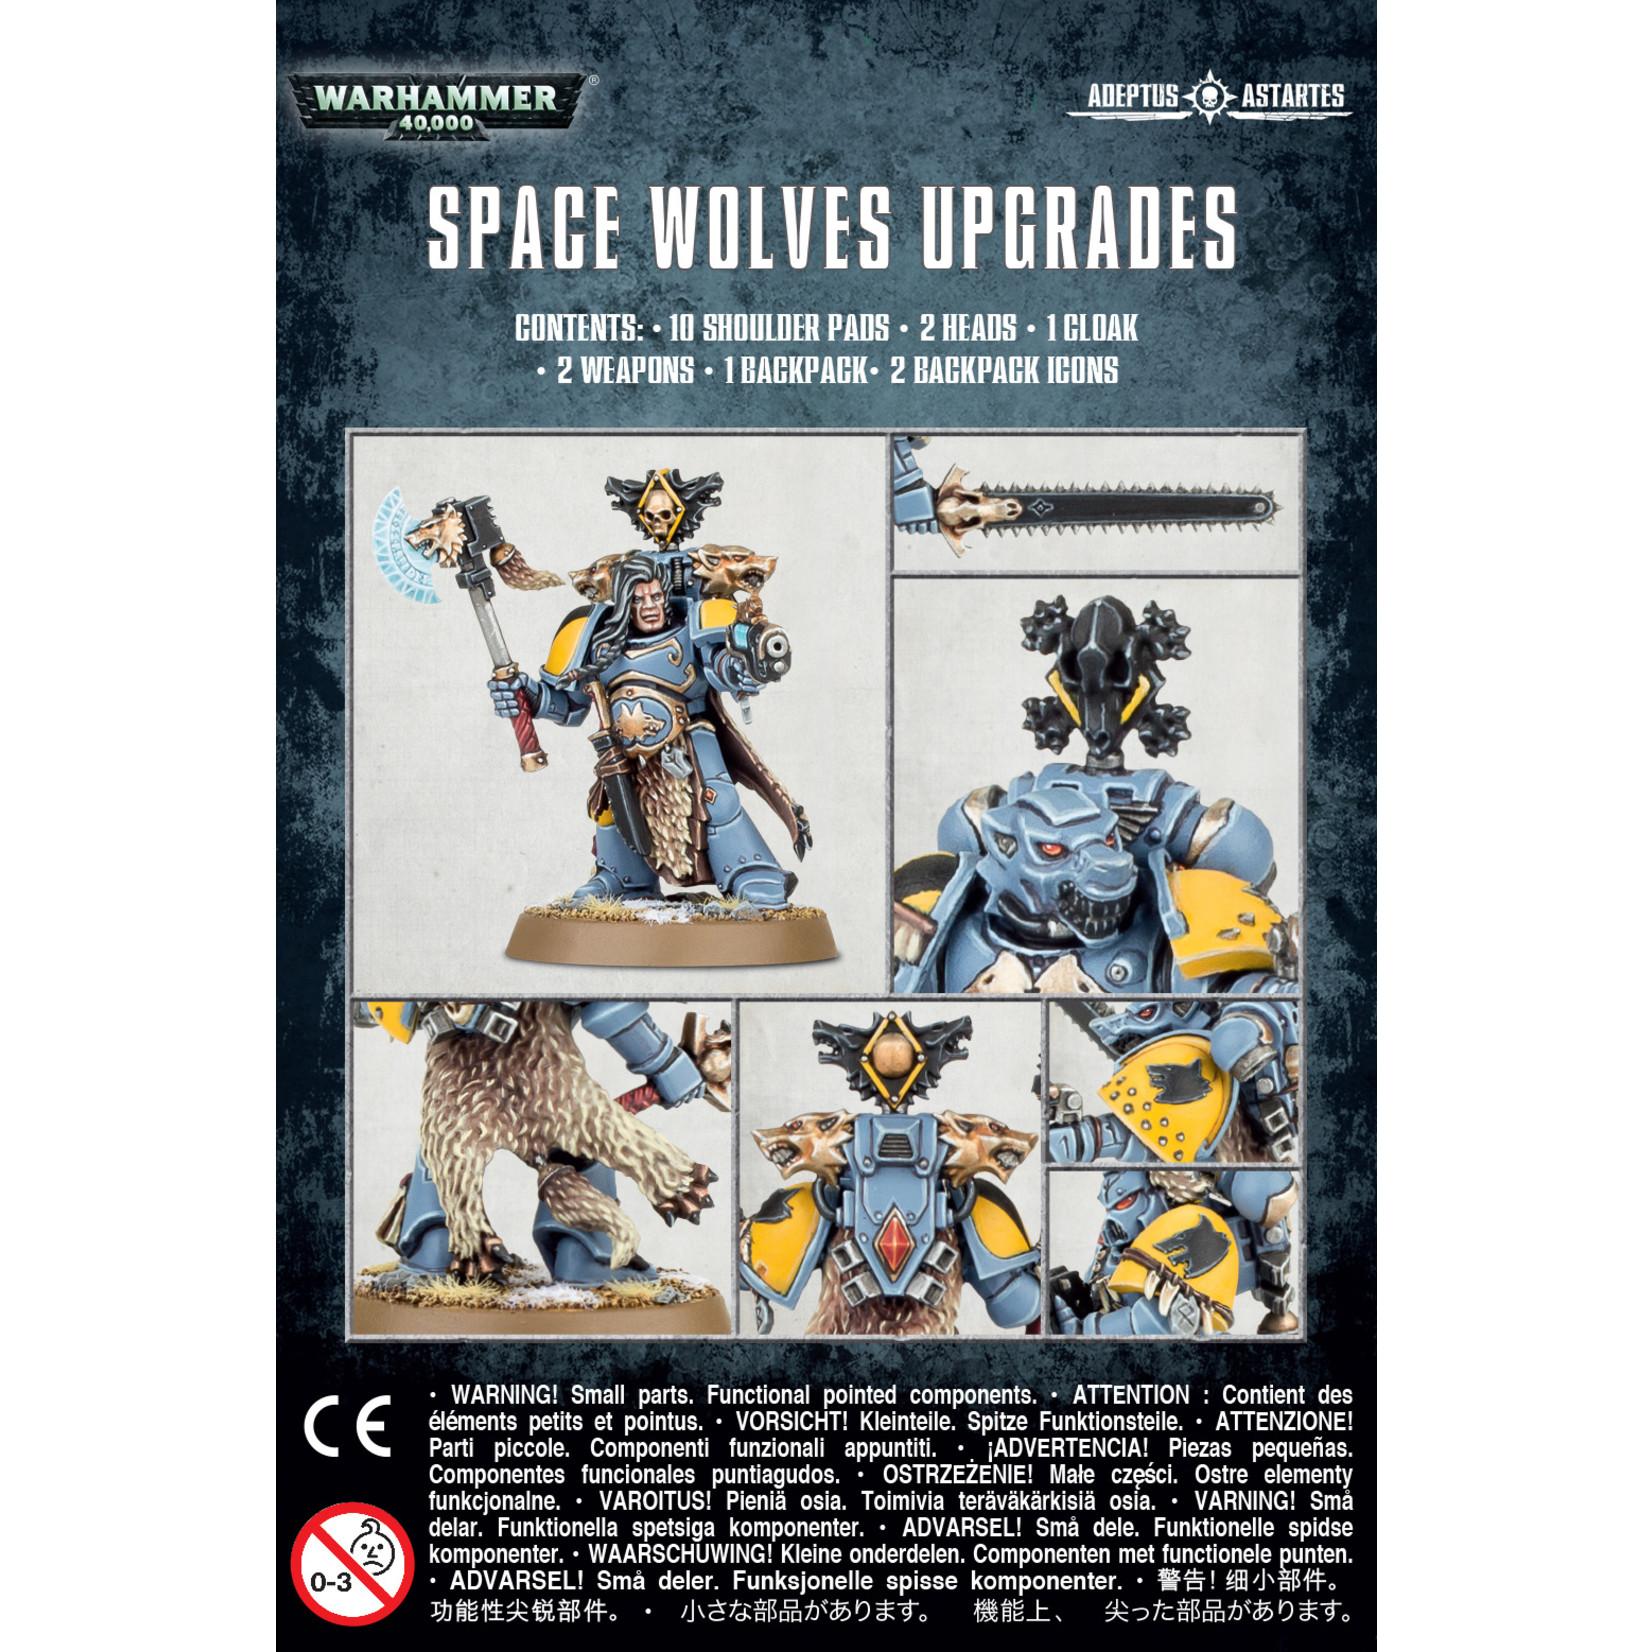 Space Wolves Primaris Upgrades (40K)